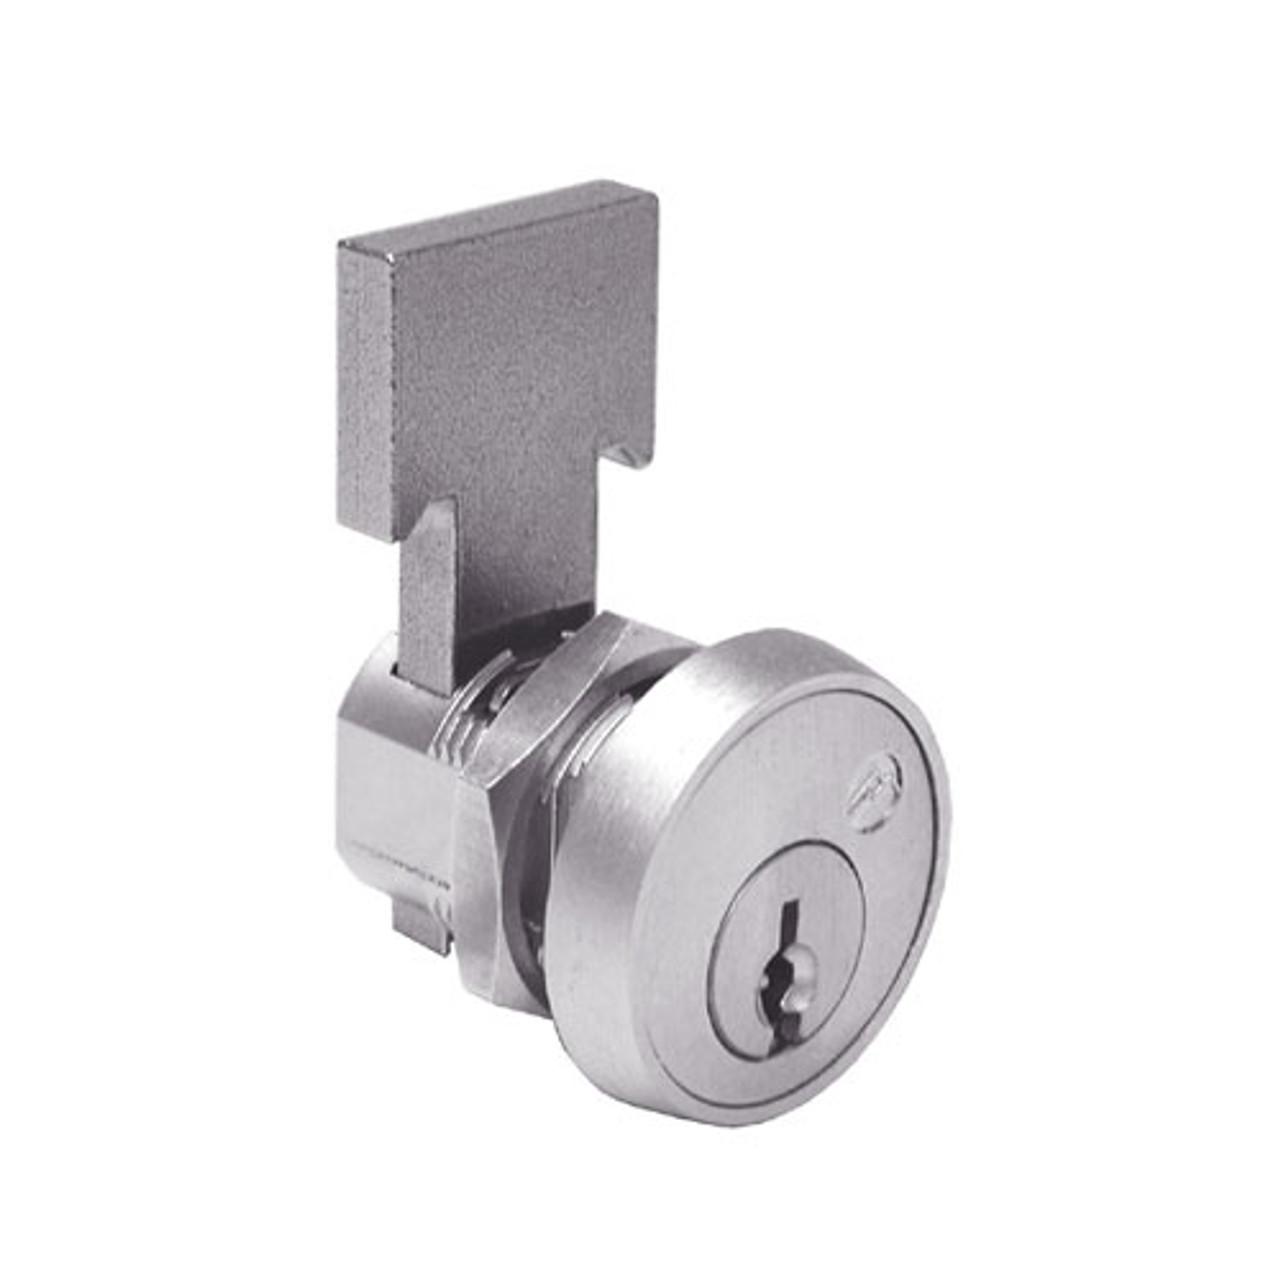 Olympus T37-KA101-26D Cabinet Locks in Satin Chrome Finish